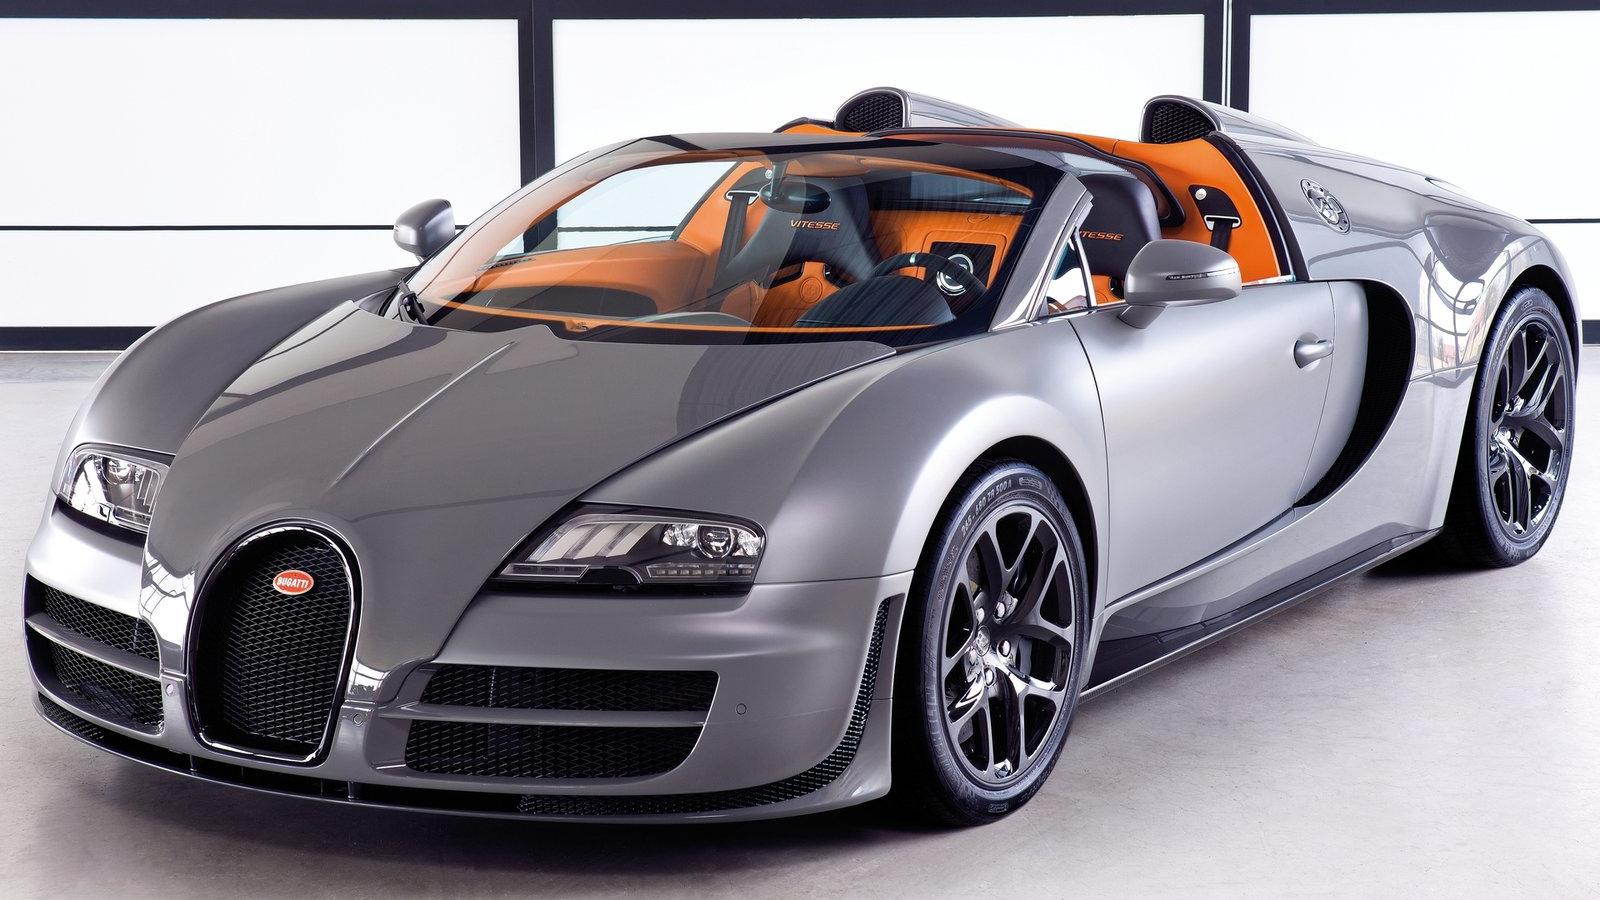 car wallpapers in good images 2012 bugatti veyron grand sport vitesse 8 0 w16 quad turbo 1200